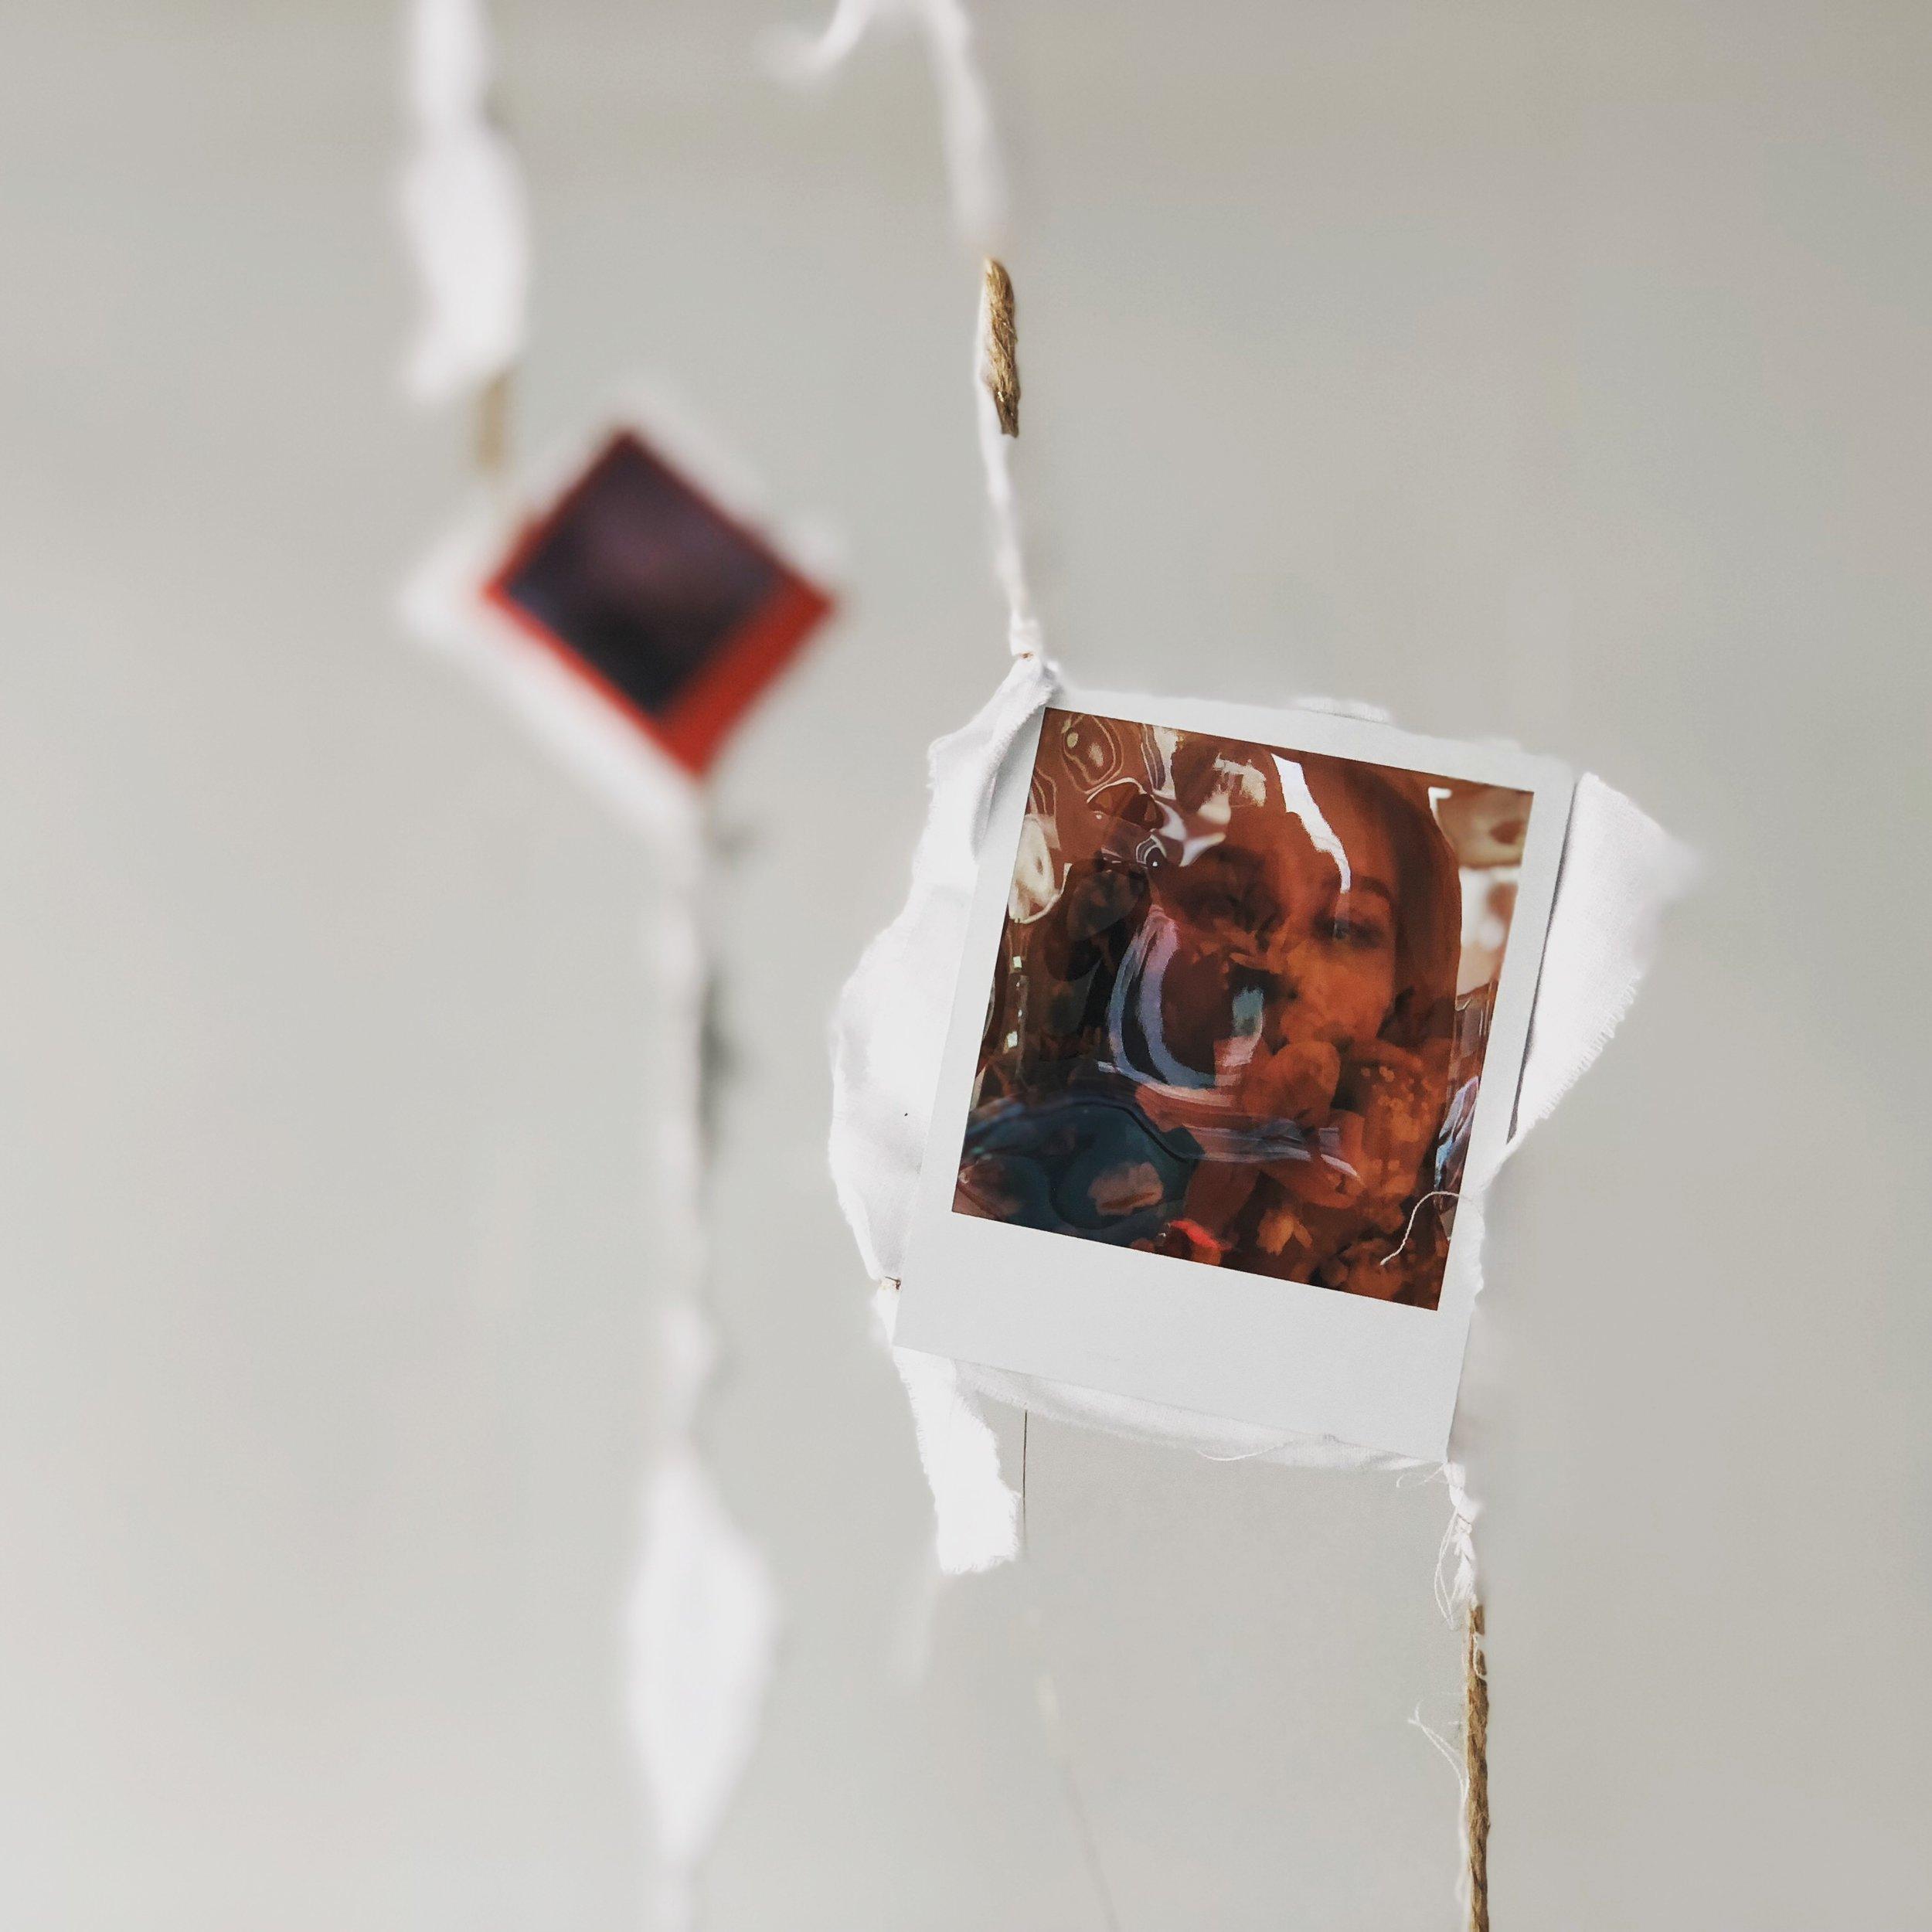 Liz O'Brien installation